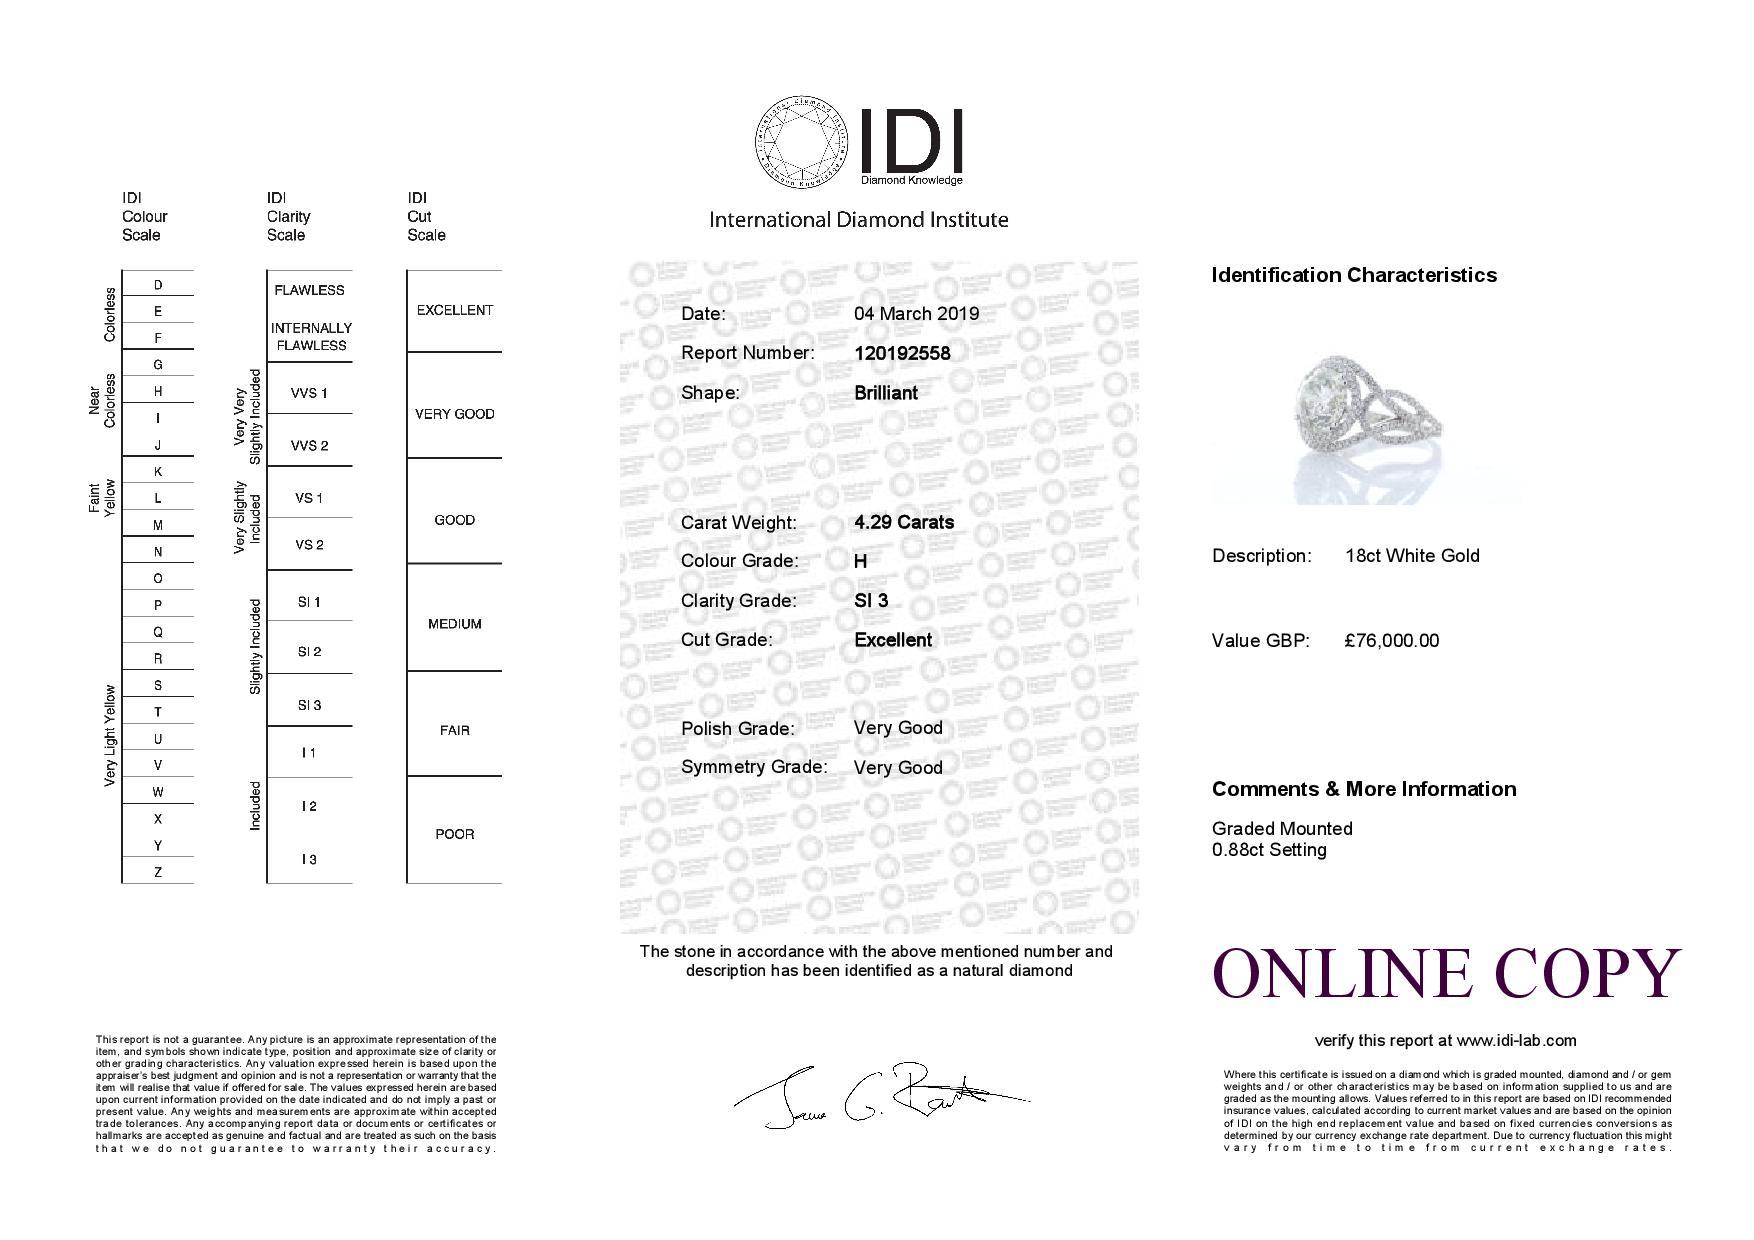 18k White Gold Single Stone With Halo Setting Ring 5.17 - Image 5 of 5